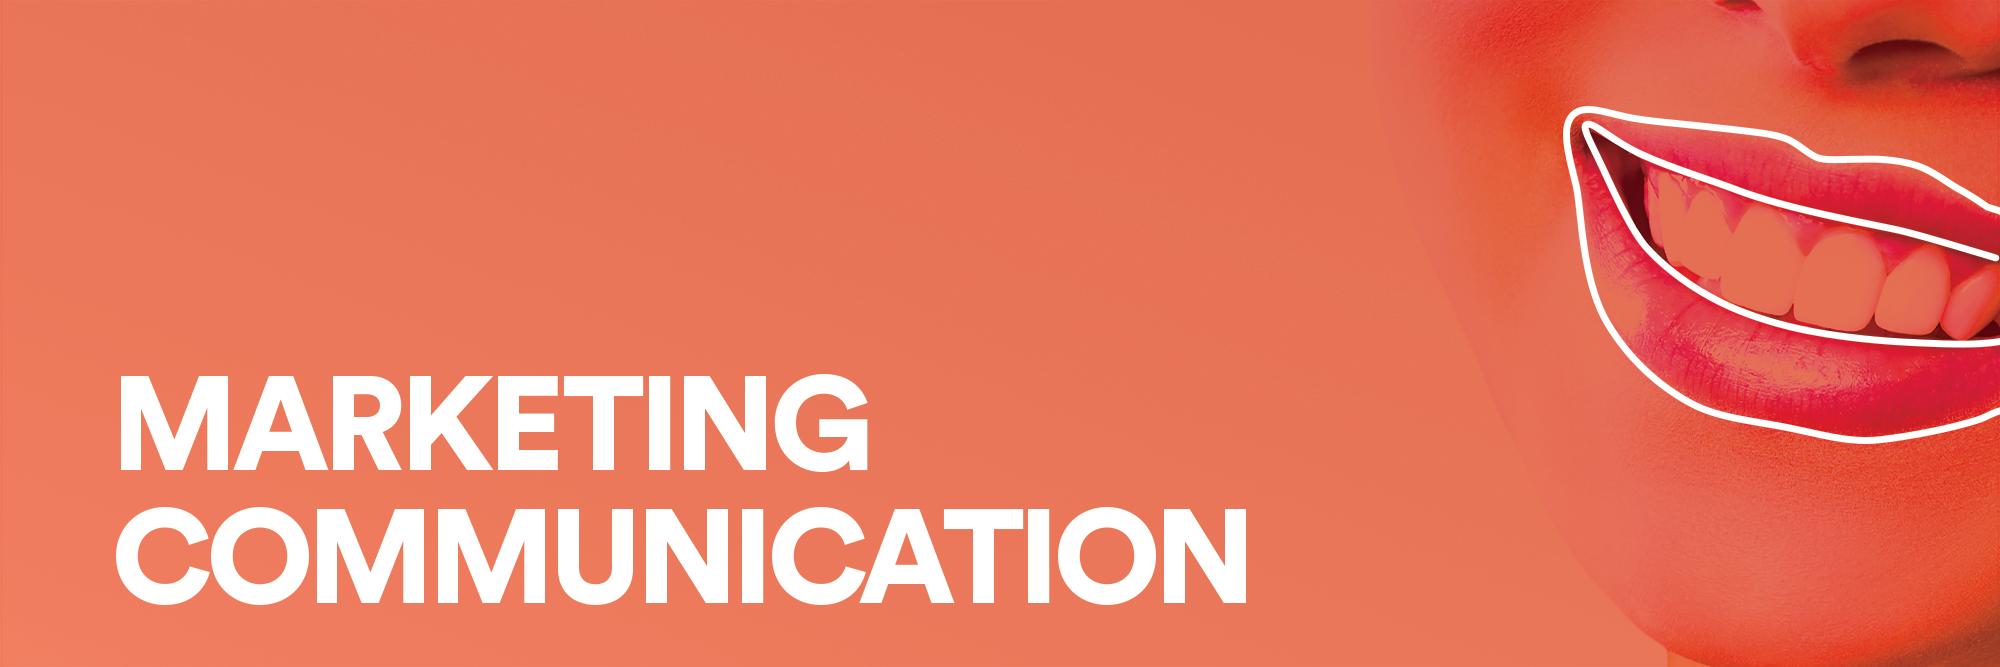 Evenements-univers-marketing-communication